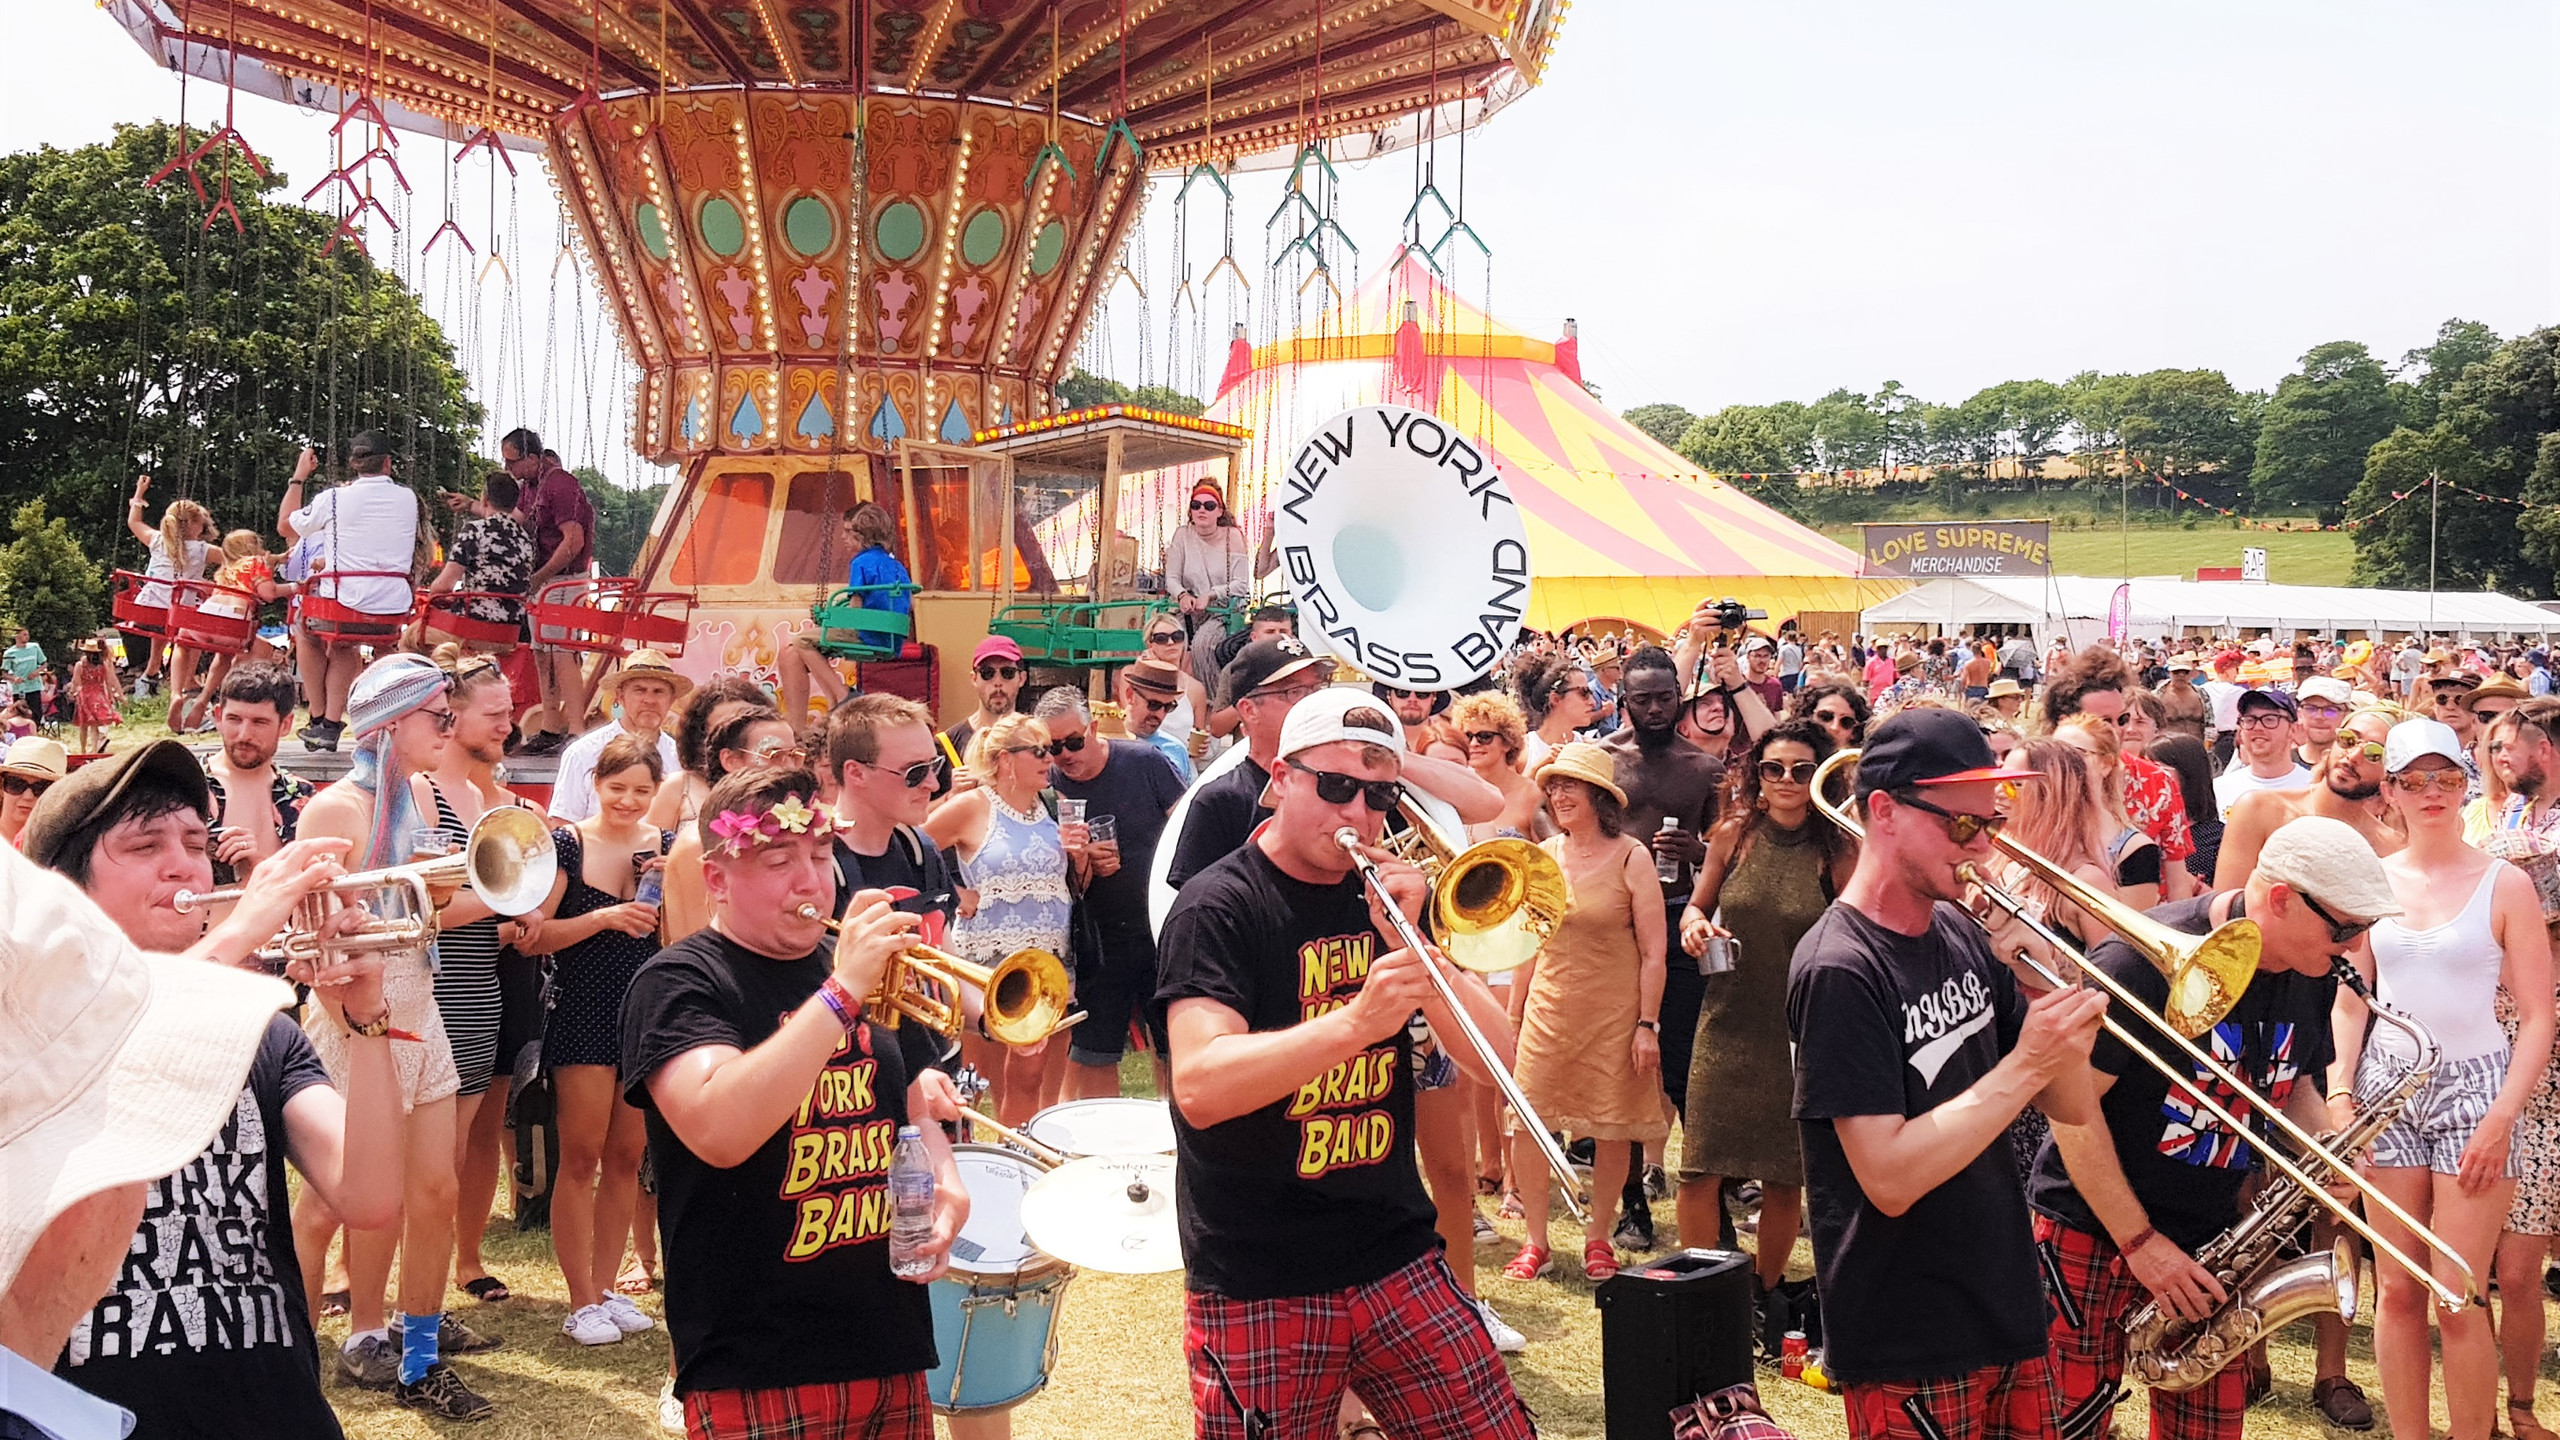 New York Brass Band _ Love Supreme 2